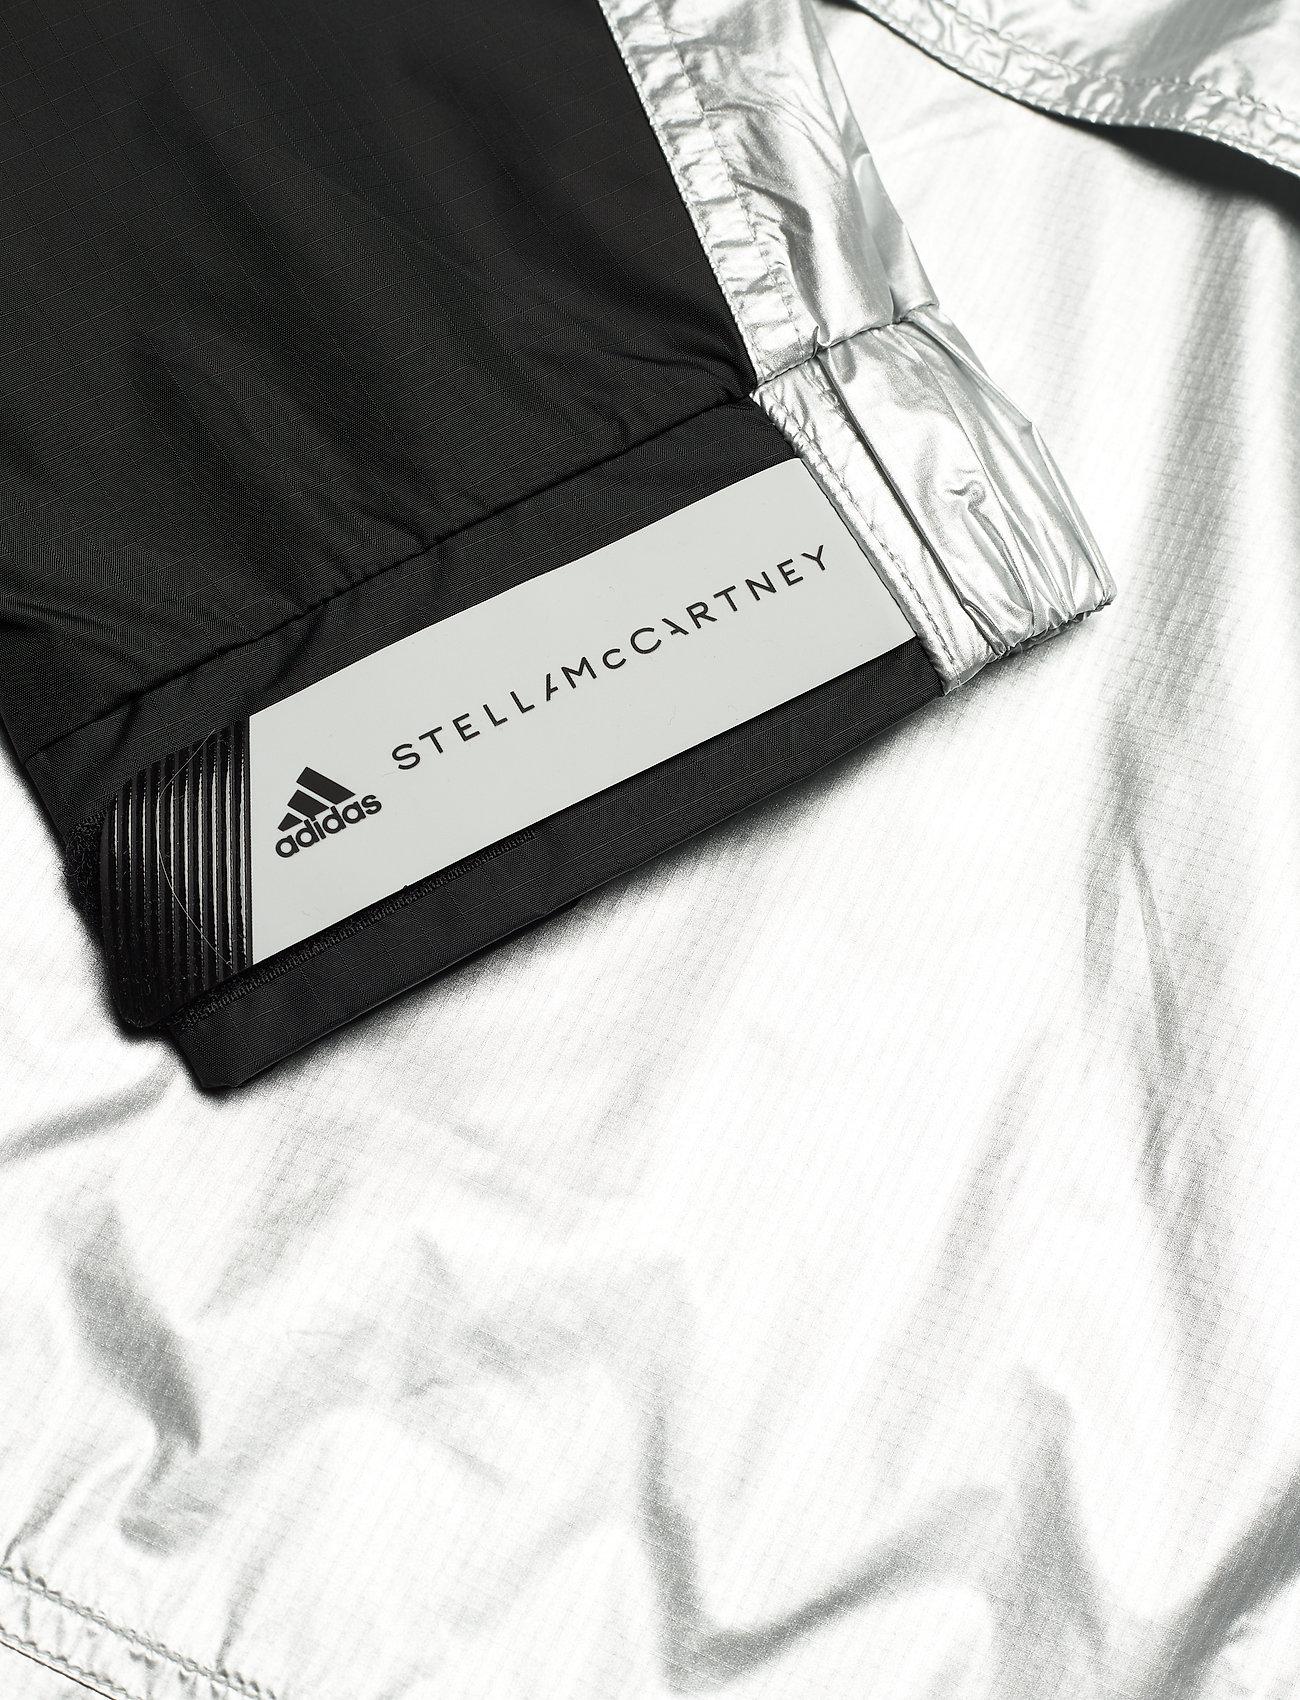 adidas by Stella McCartney - URBXTR PULLON - training jackets - black/metsil - 6